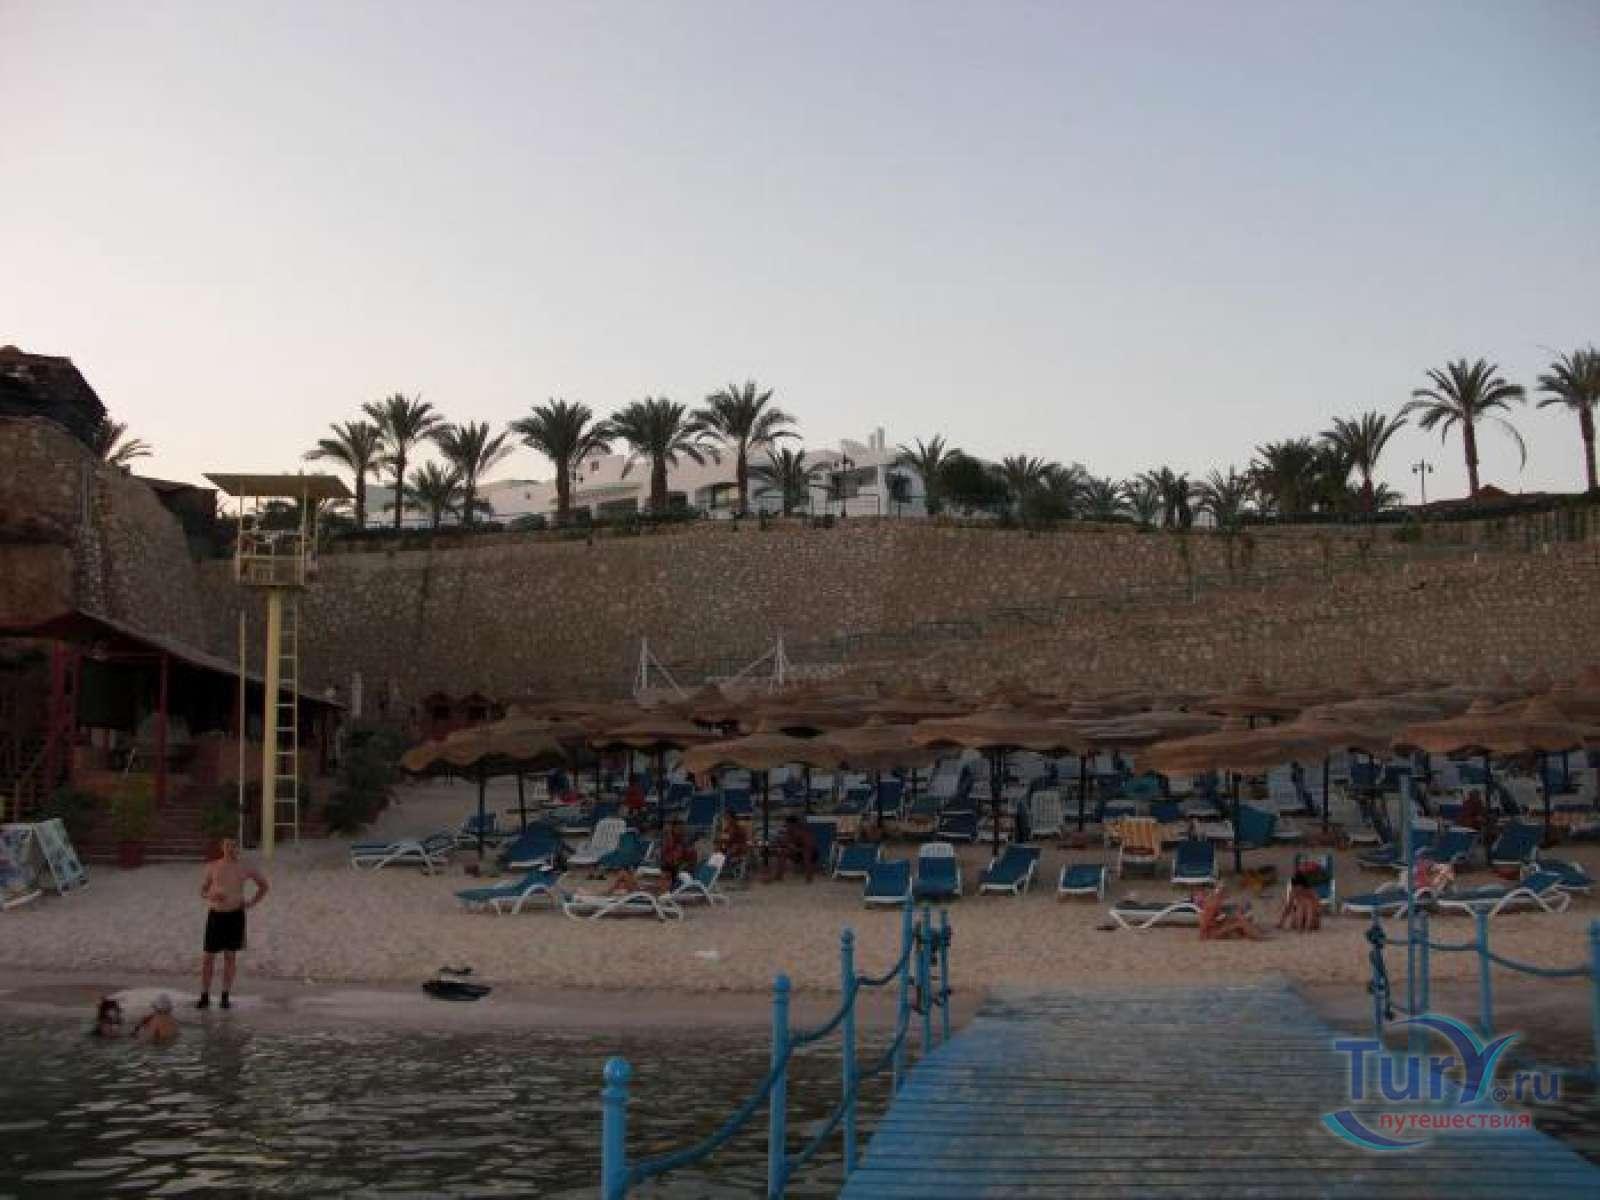 tur v egipet sharm el shejh 49 936 rub chel - Тур в Египет Шарм-Эль-Шейх 49 936 руб. чел.